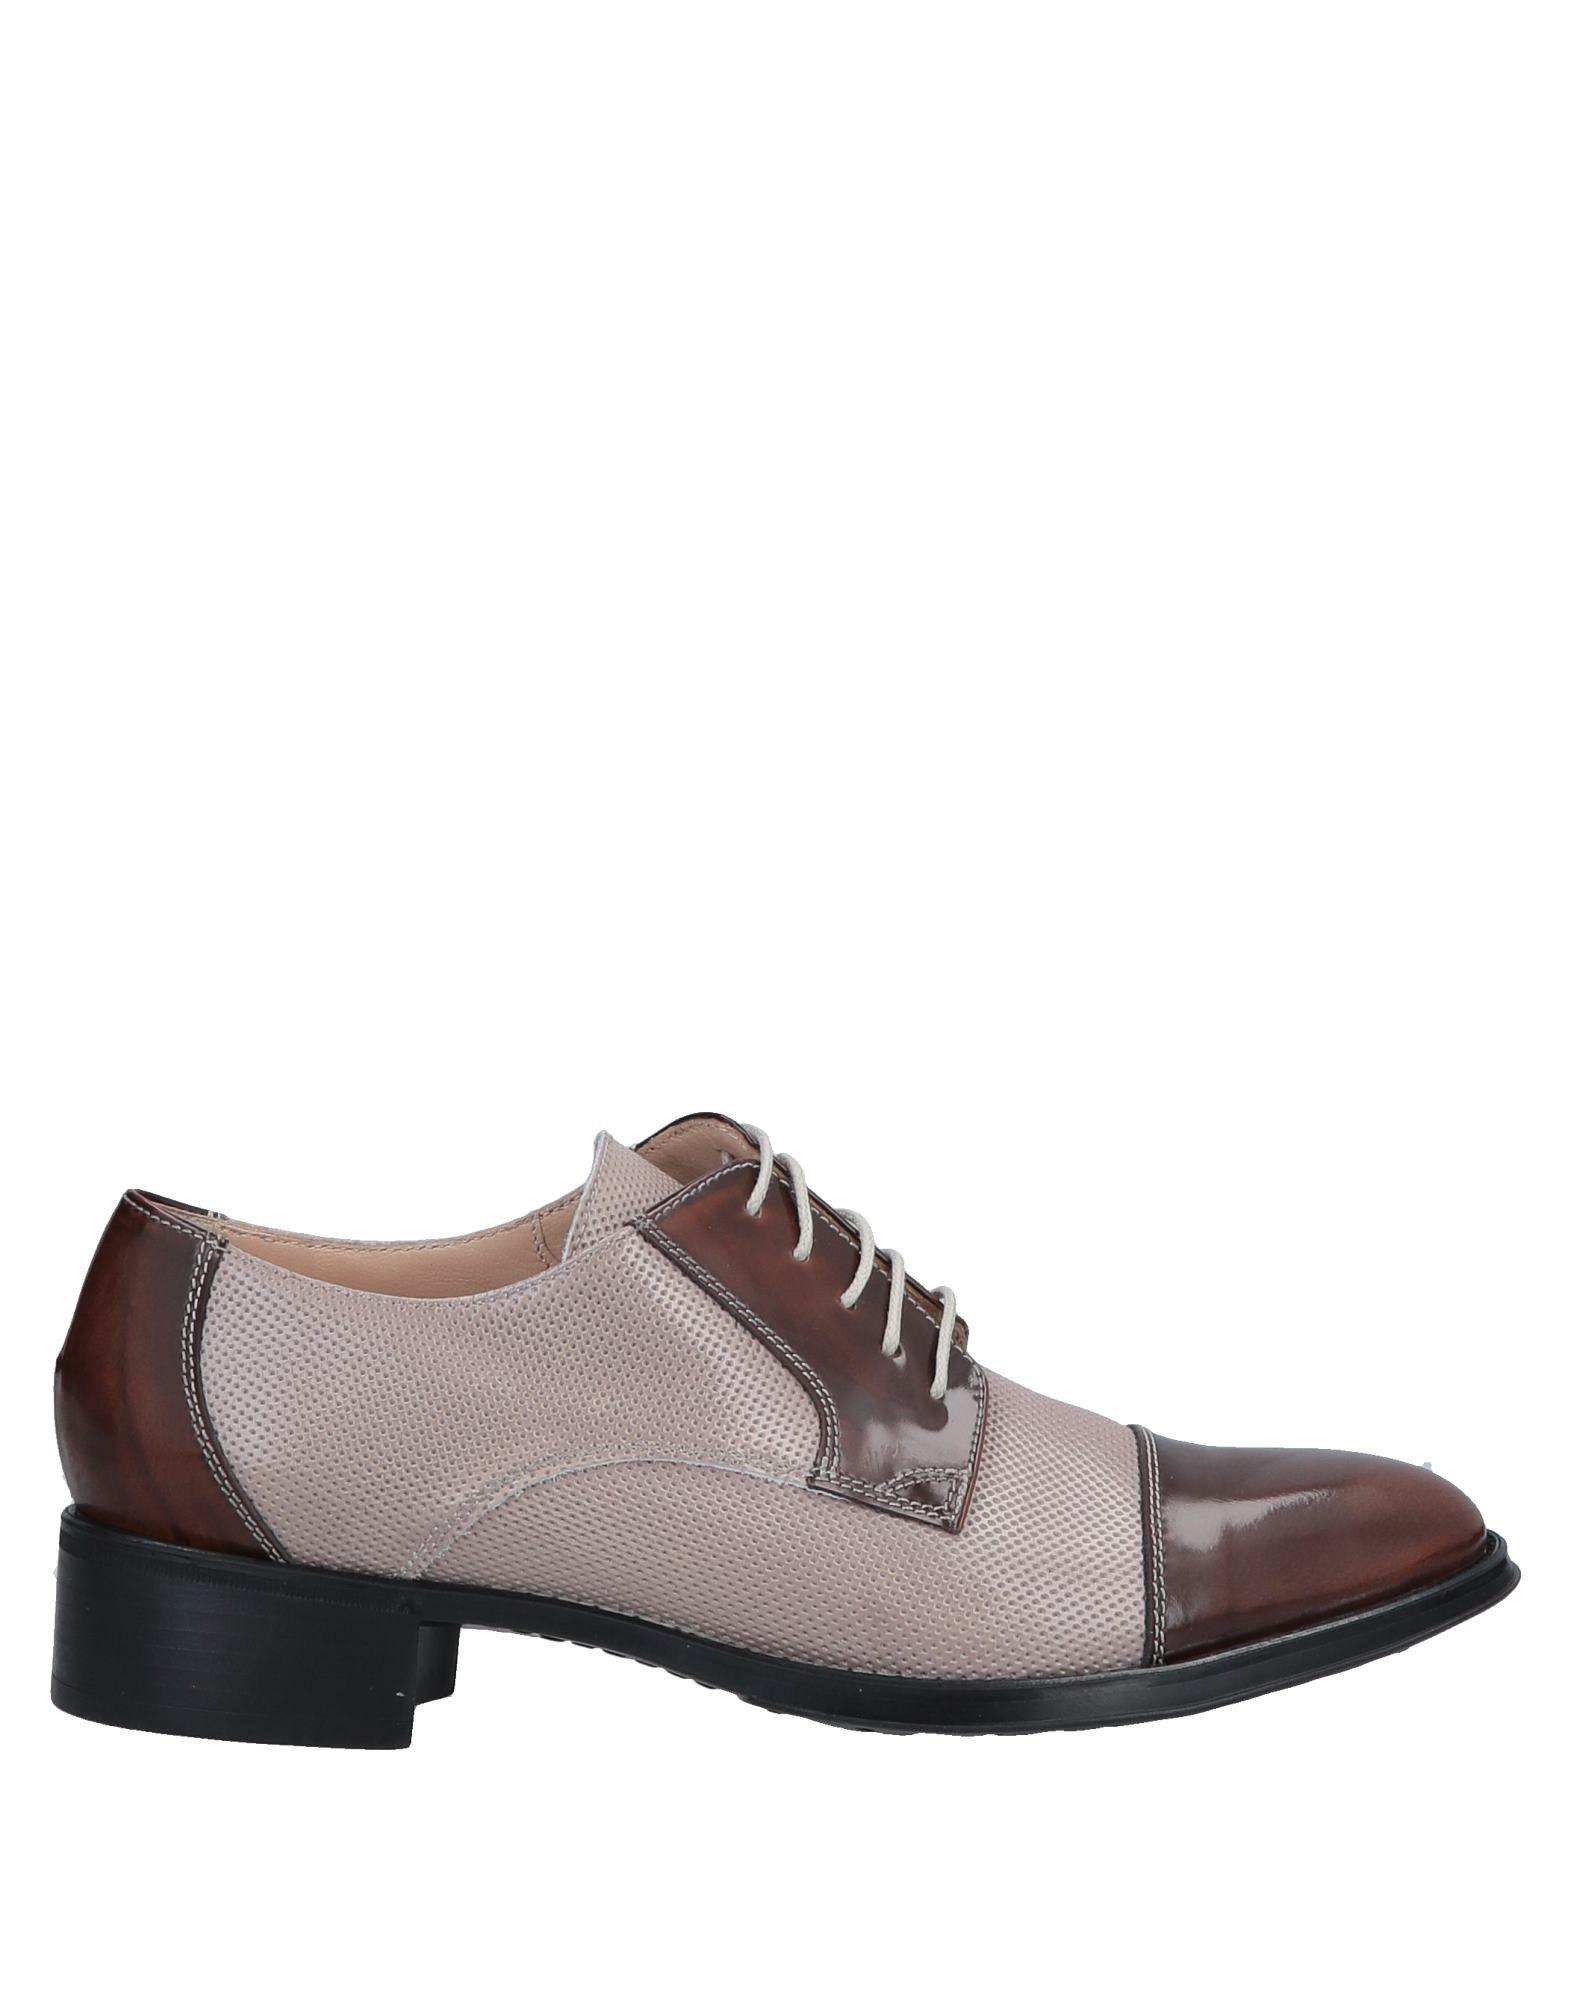 F.LLI BRUGLIA Обувь на шнурках цены онлайн